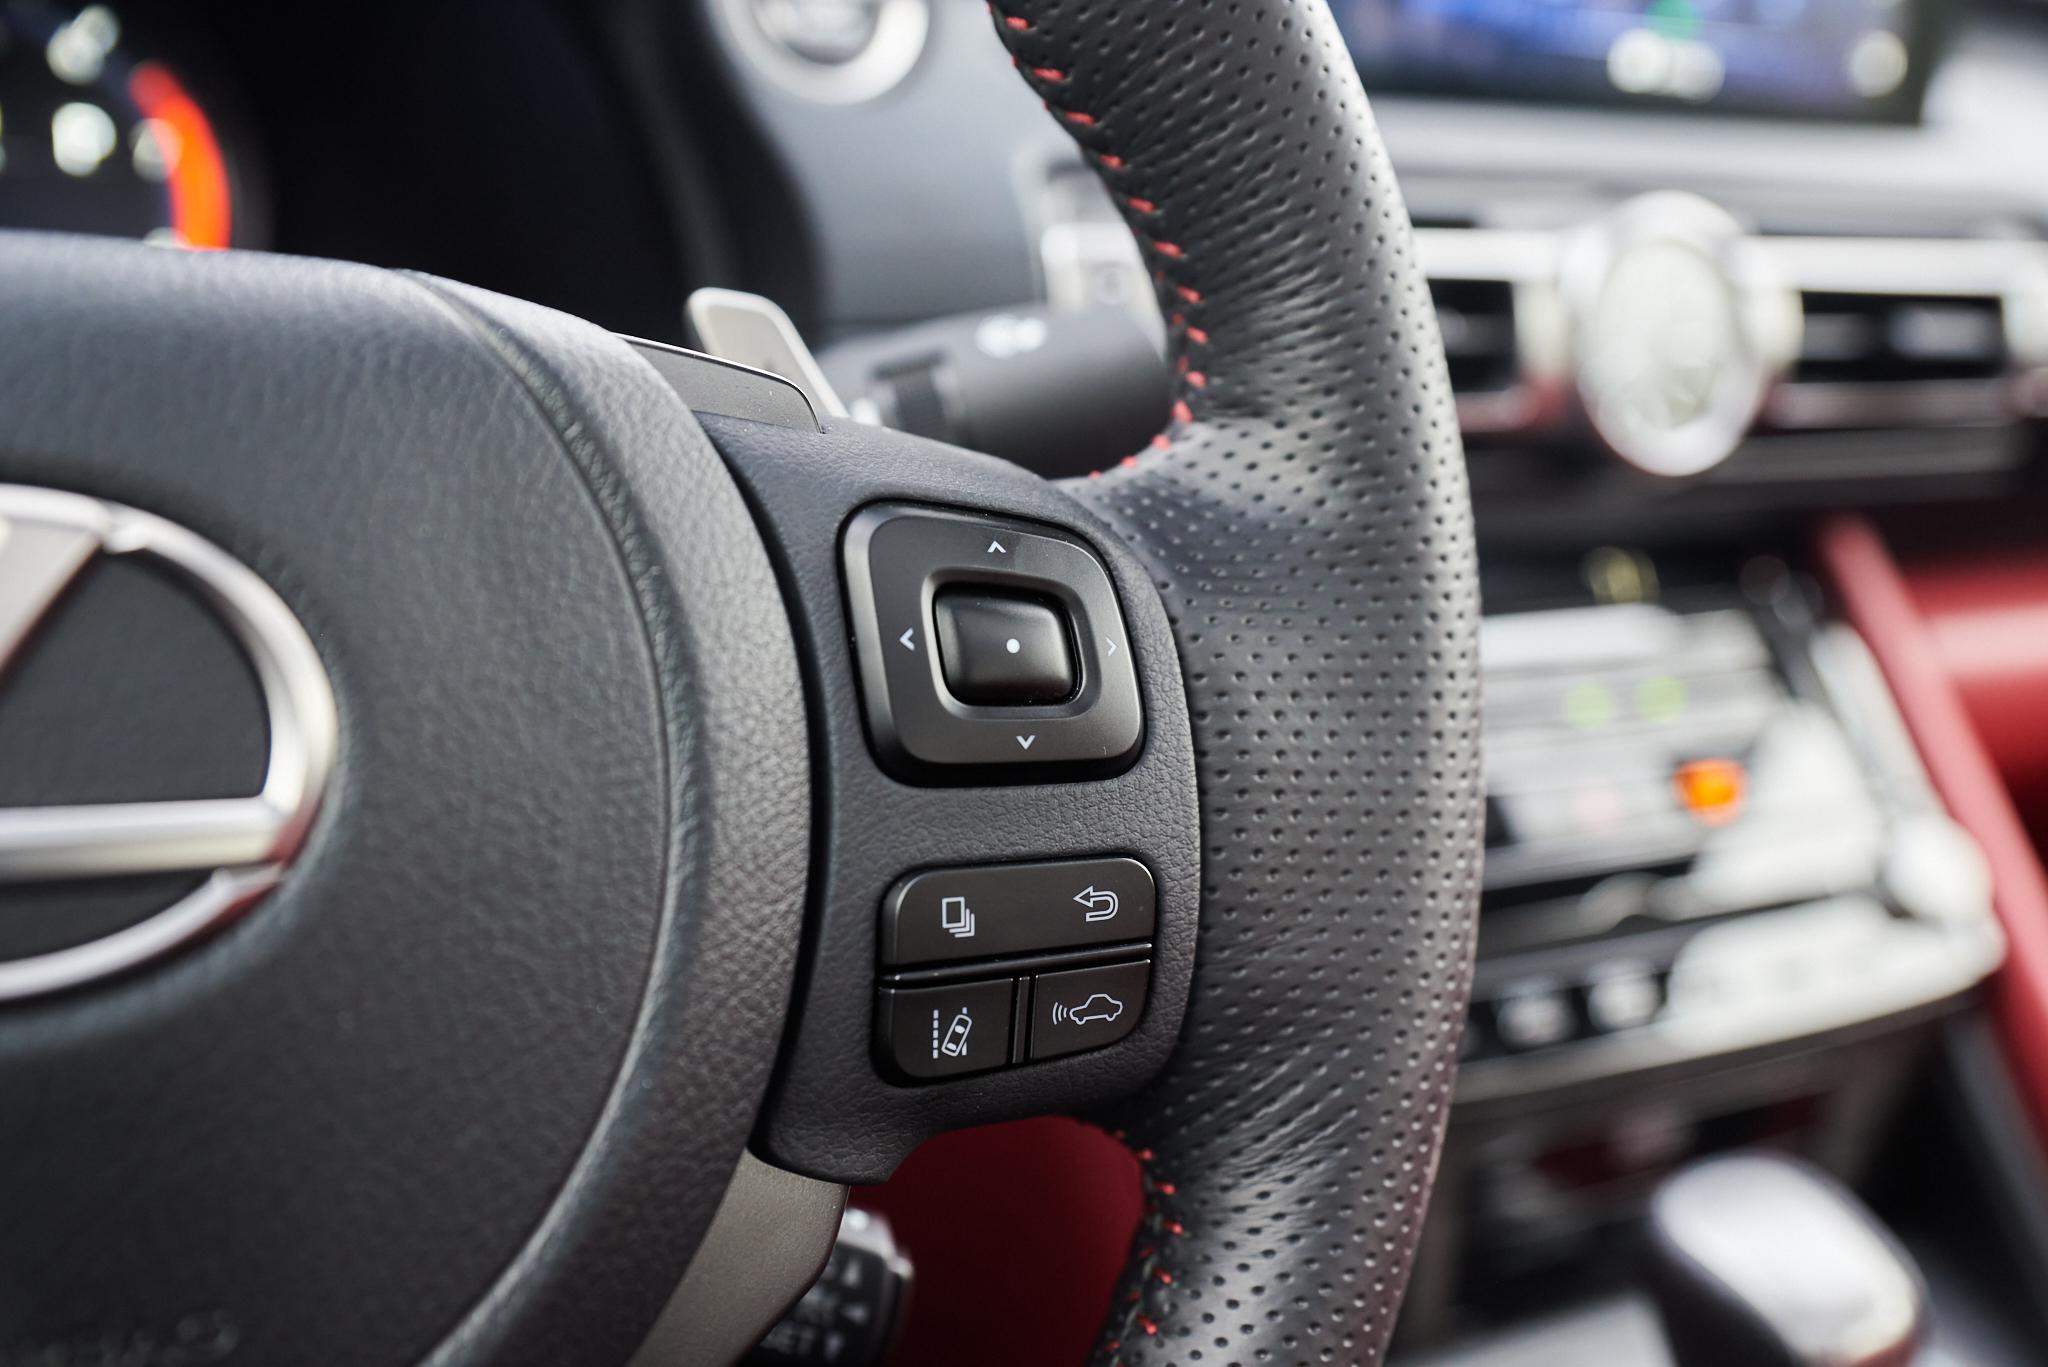 2021 Lexus IS 350 F Sport steering wheel controls